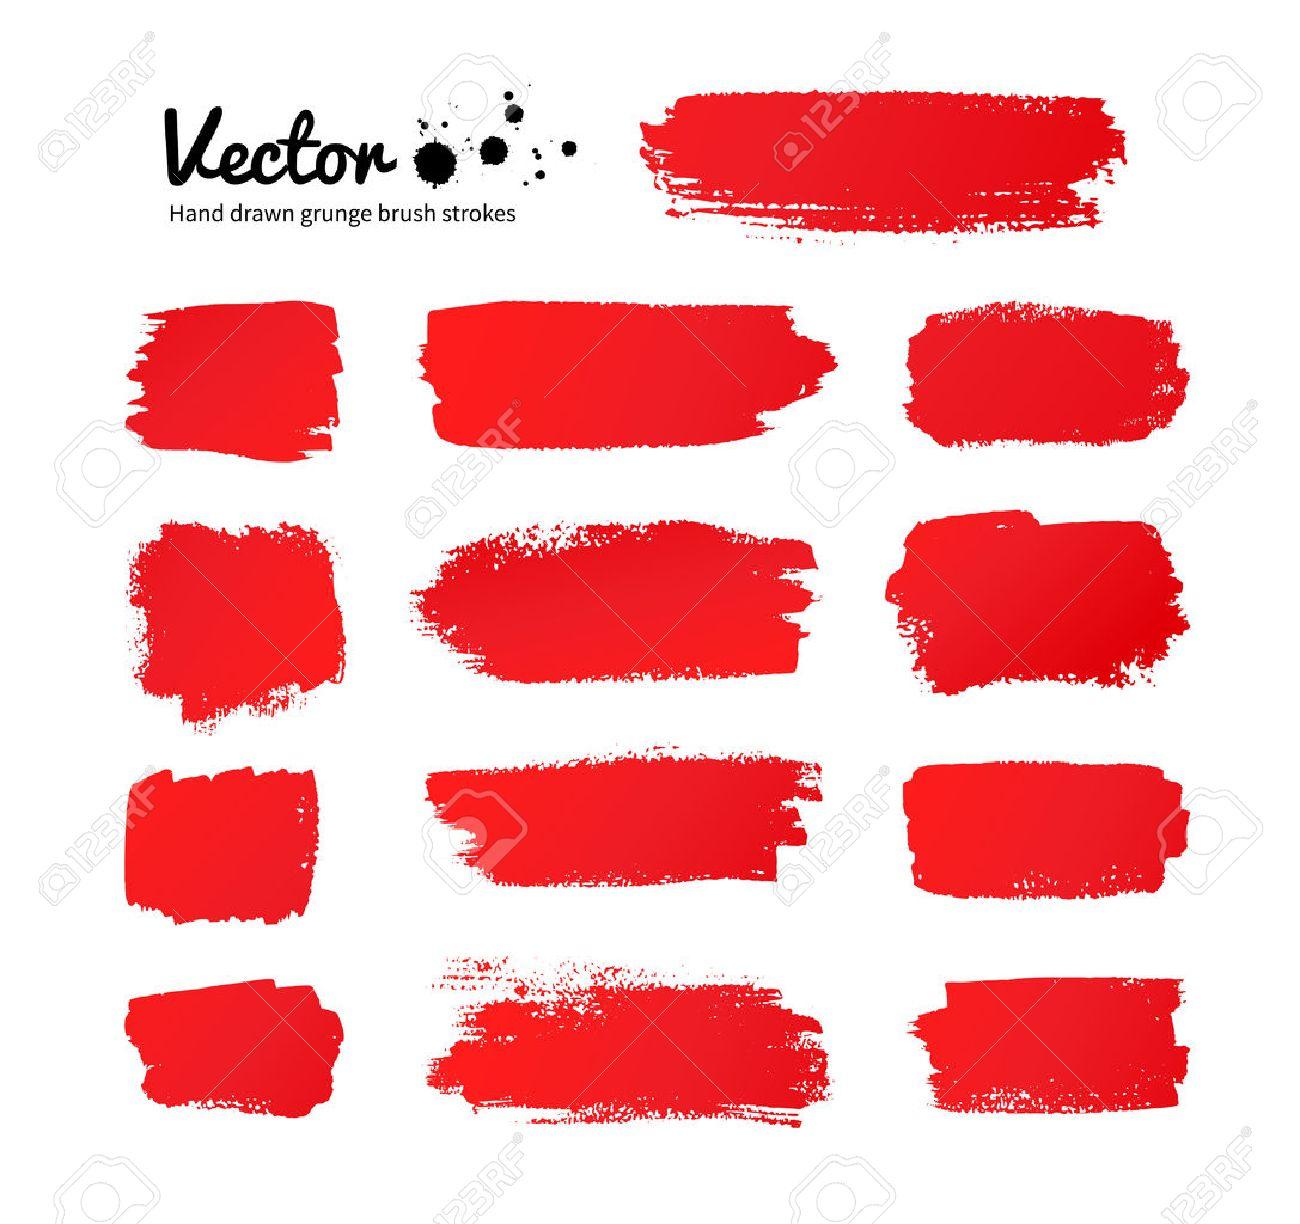 Vector grunge red paint brush strokes. - 39809595